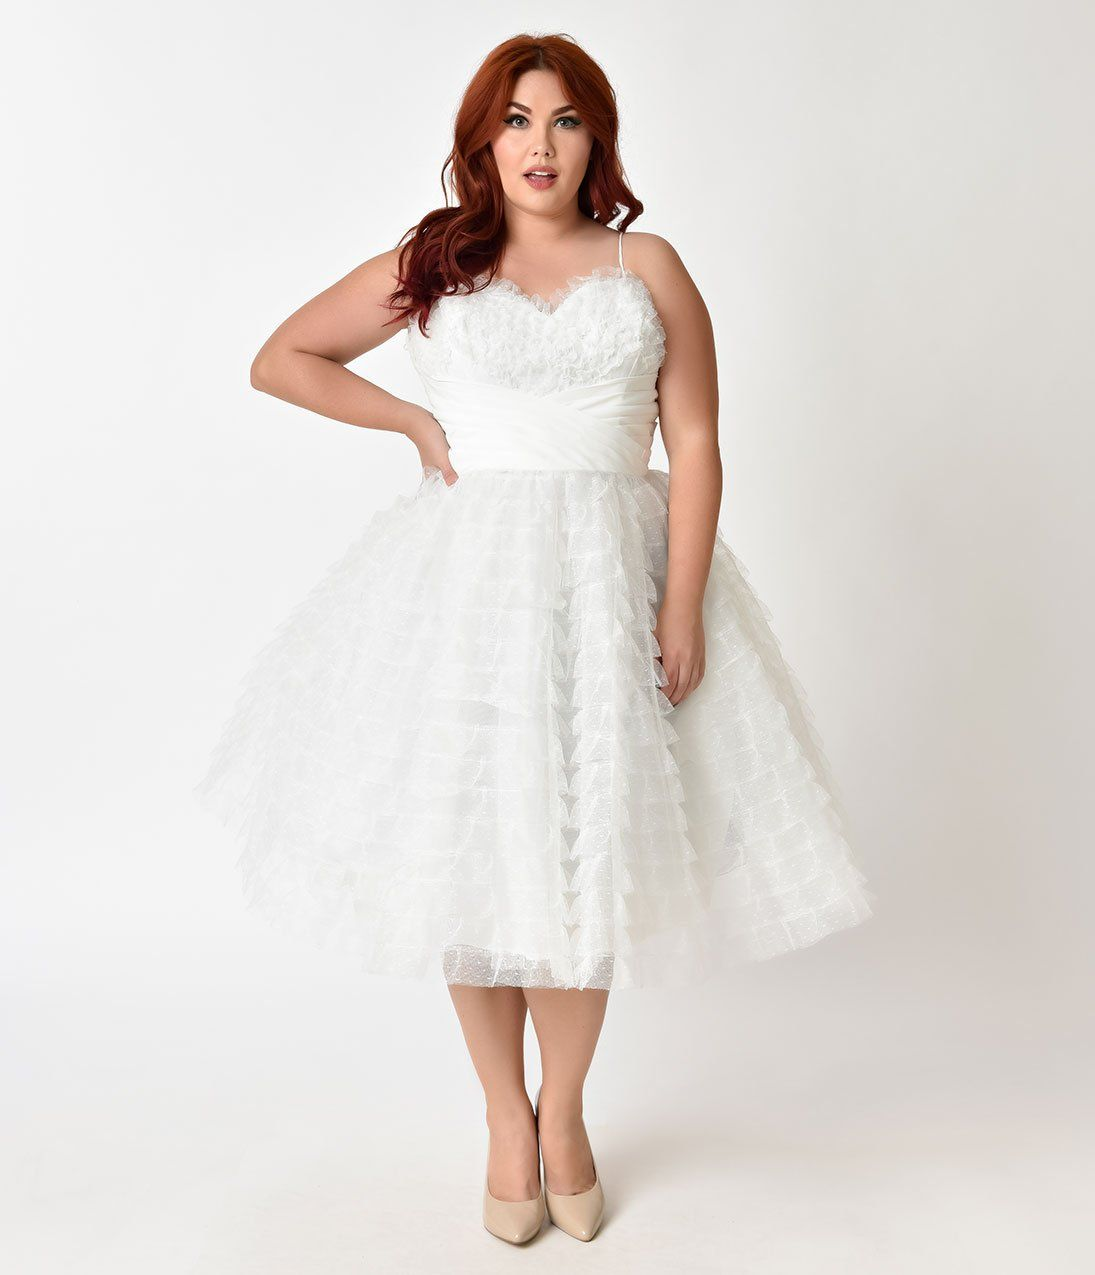 Plus size pin up style wedding dress  Unique Vintage Plus Size s White Ruffled Tulle Sweetheart